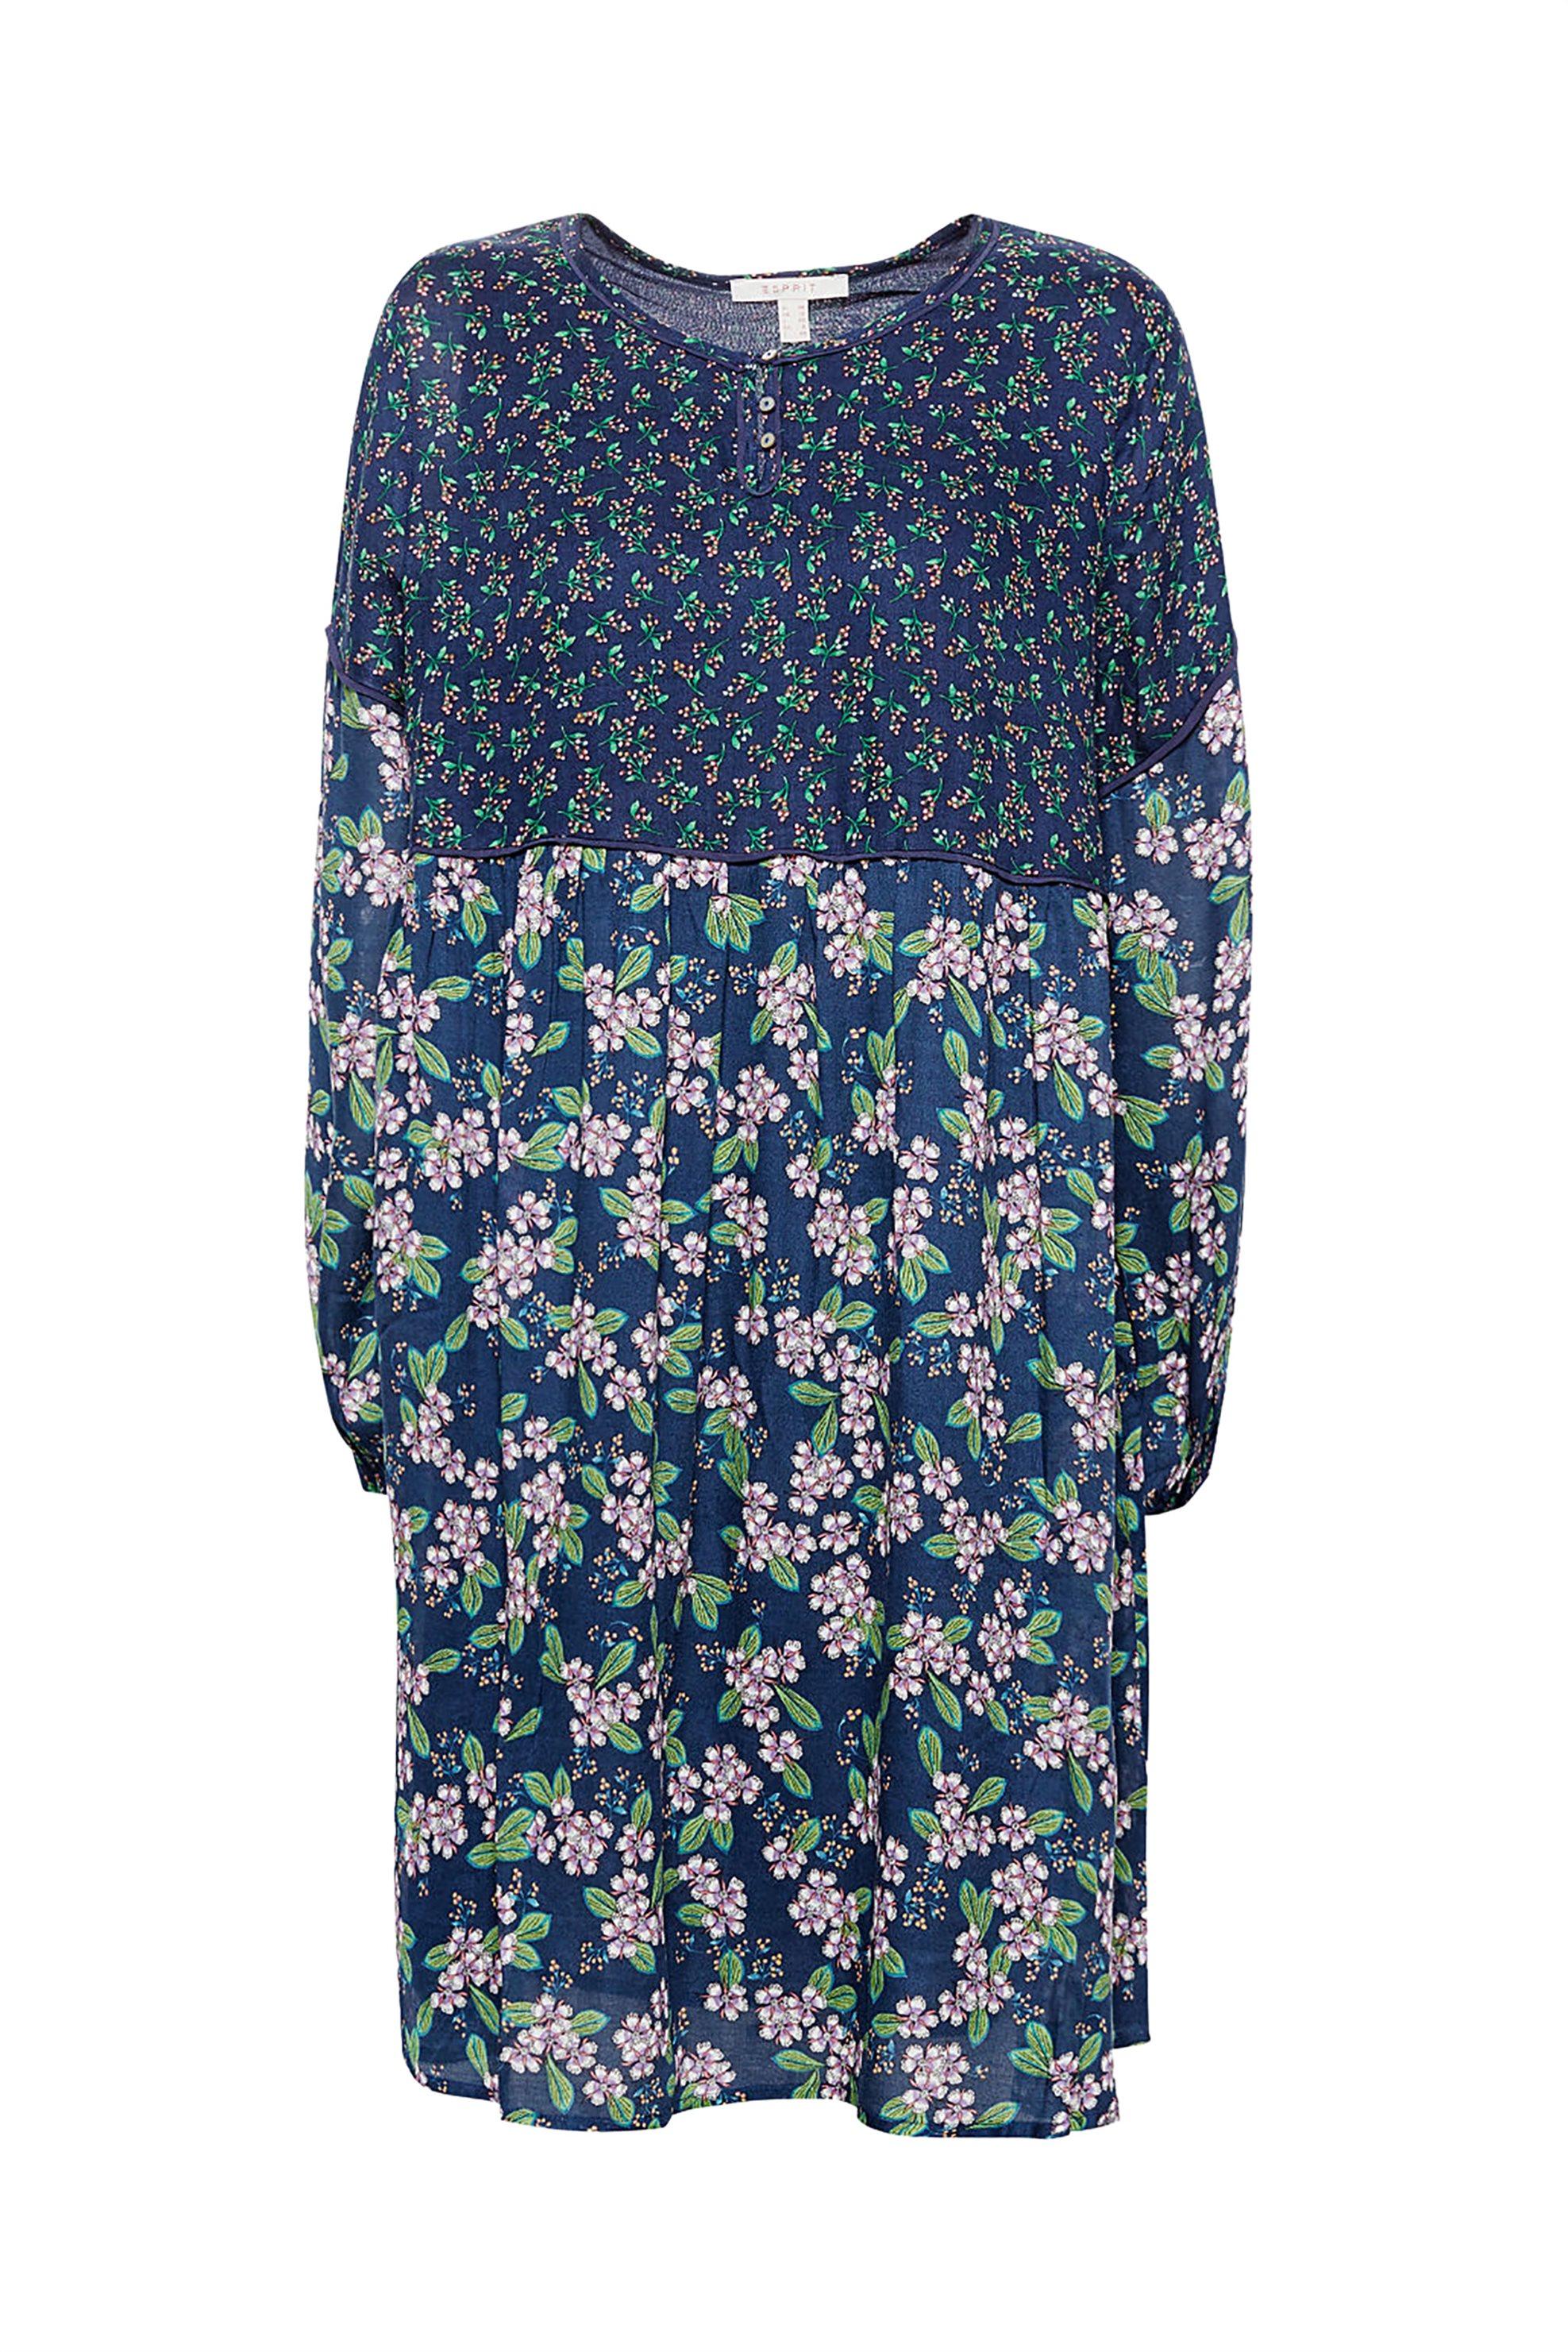 Esprit γυναικείο φόρεμα εμπριμέ - 088EE1E014 - Μπλε Σκούρο γυναικα   ρουχα   φορέματα   mini φορέματα